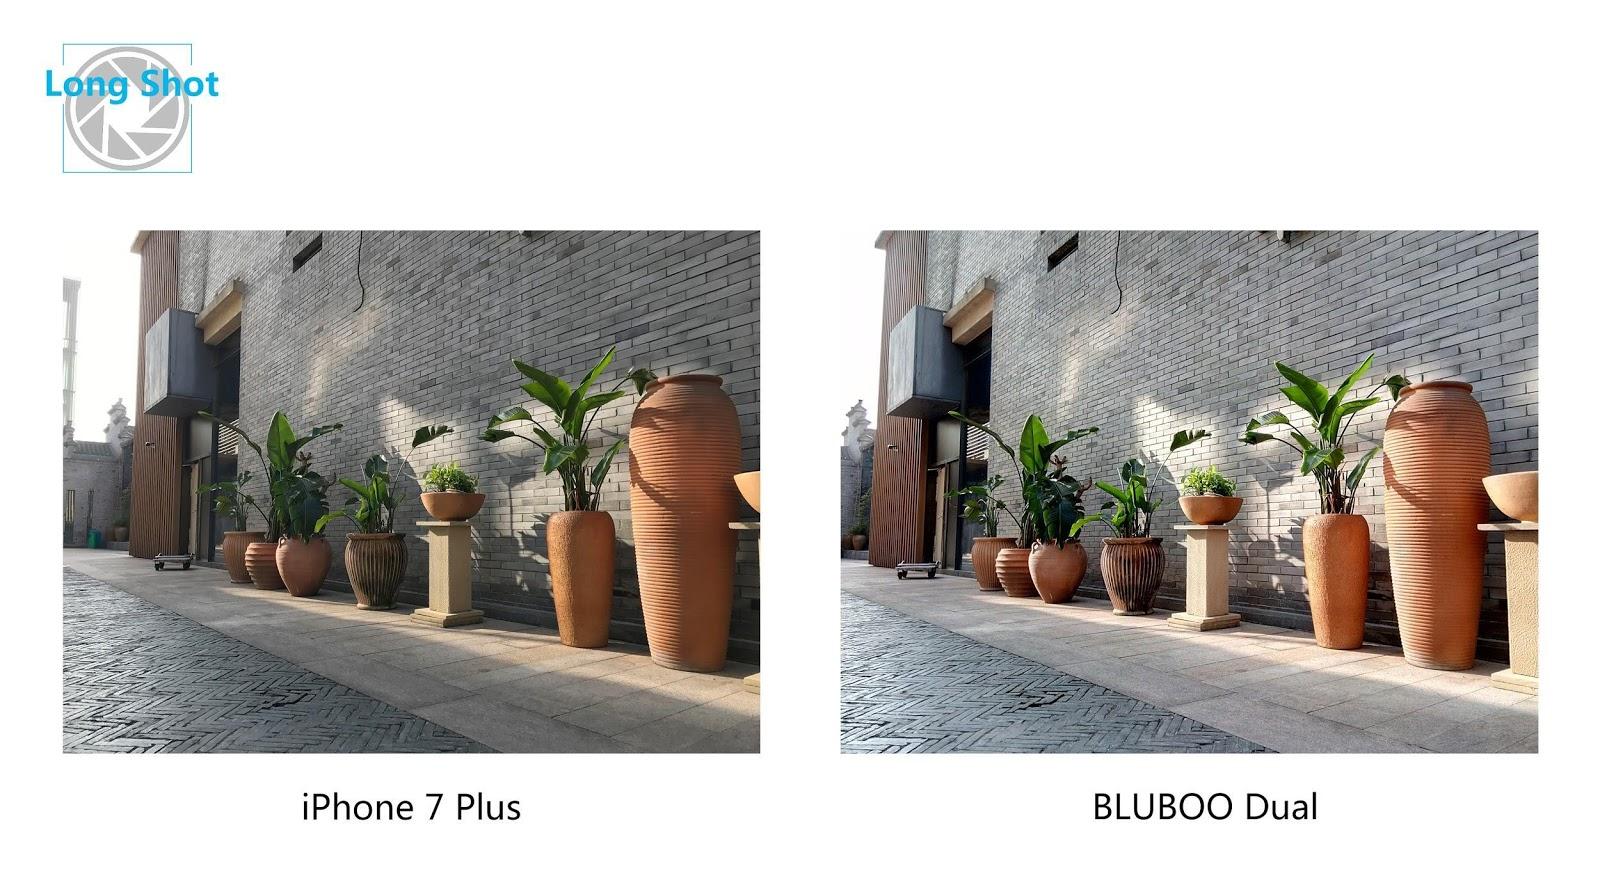 bluboo_iphone_street